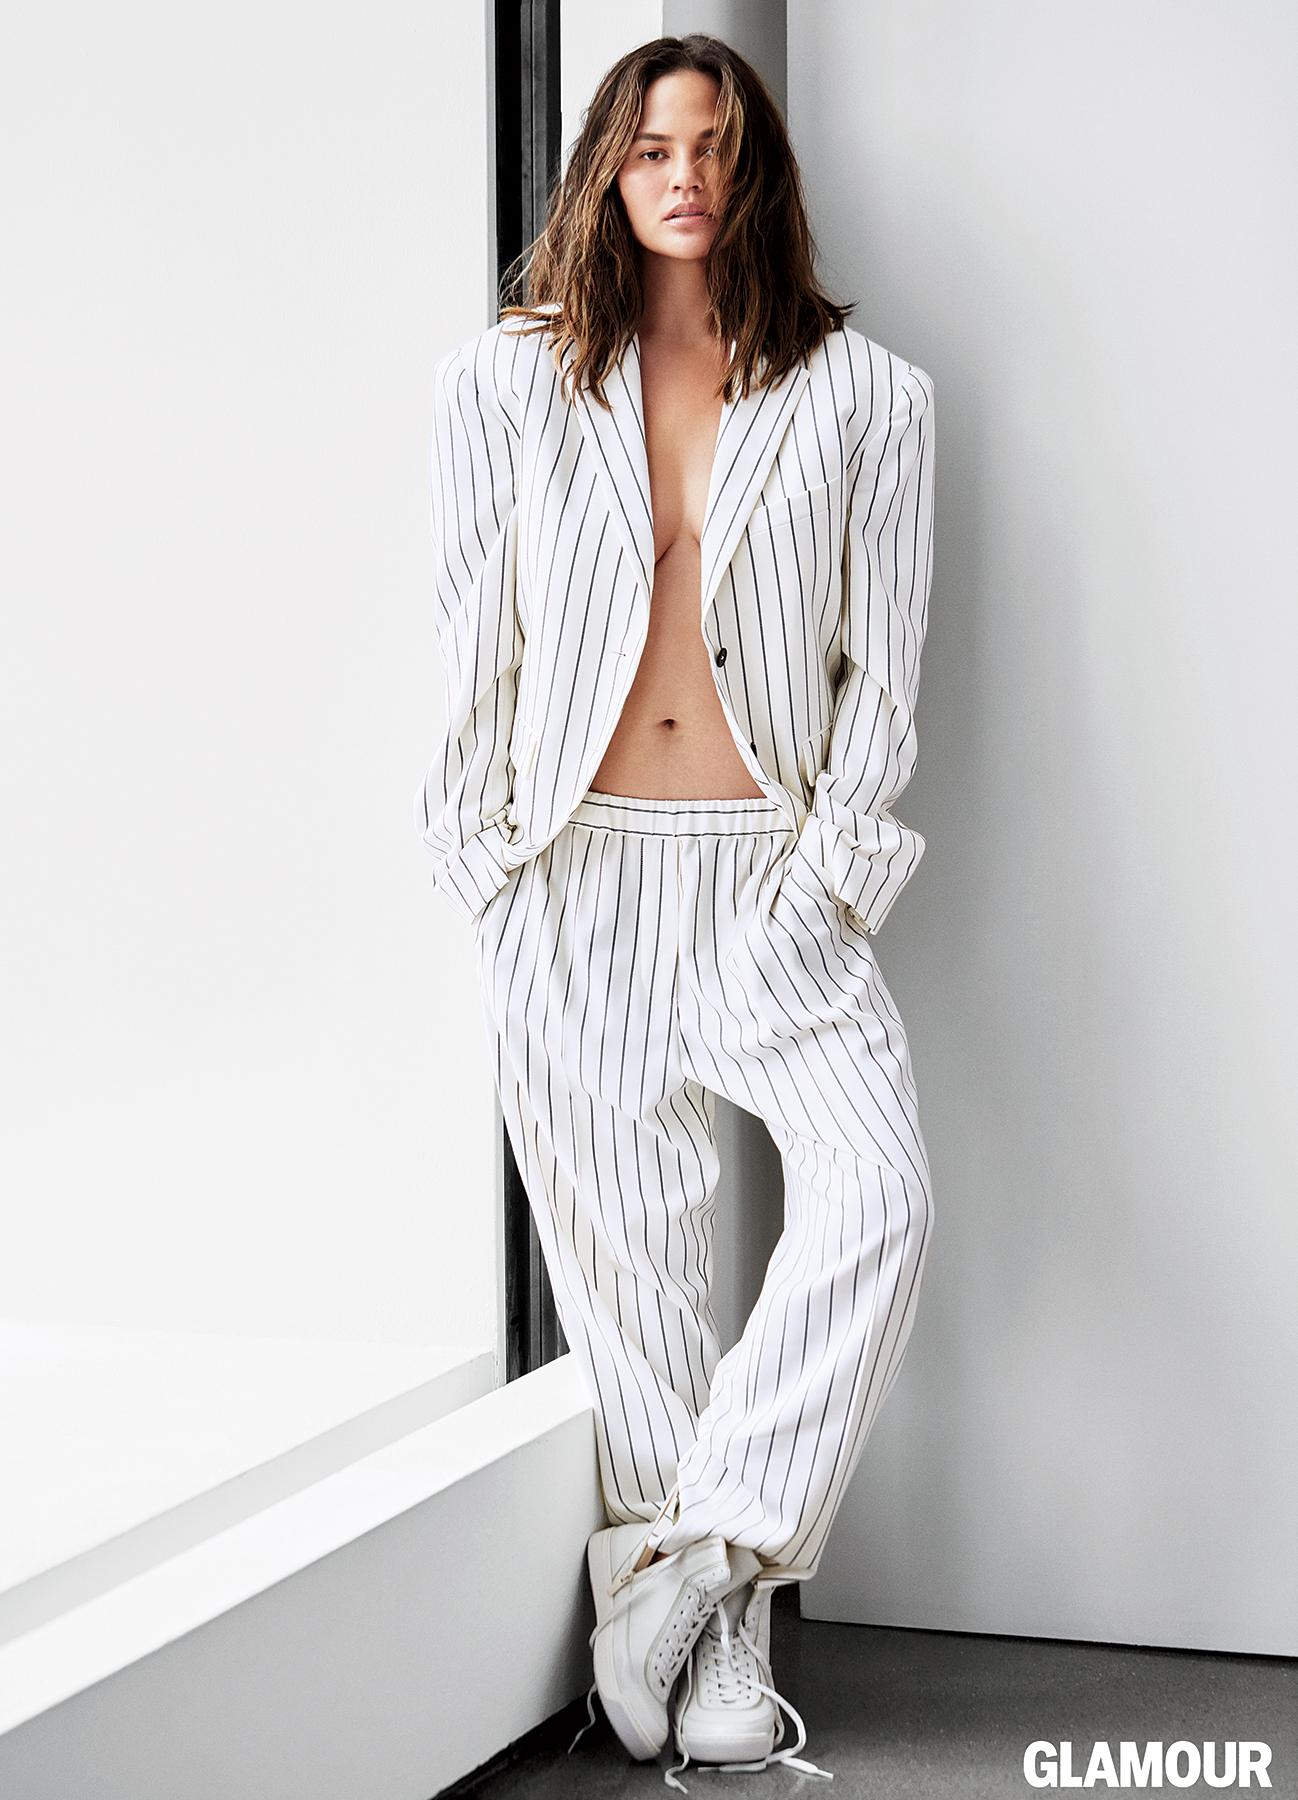 Chrissy Teigen Glamour